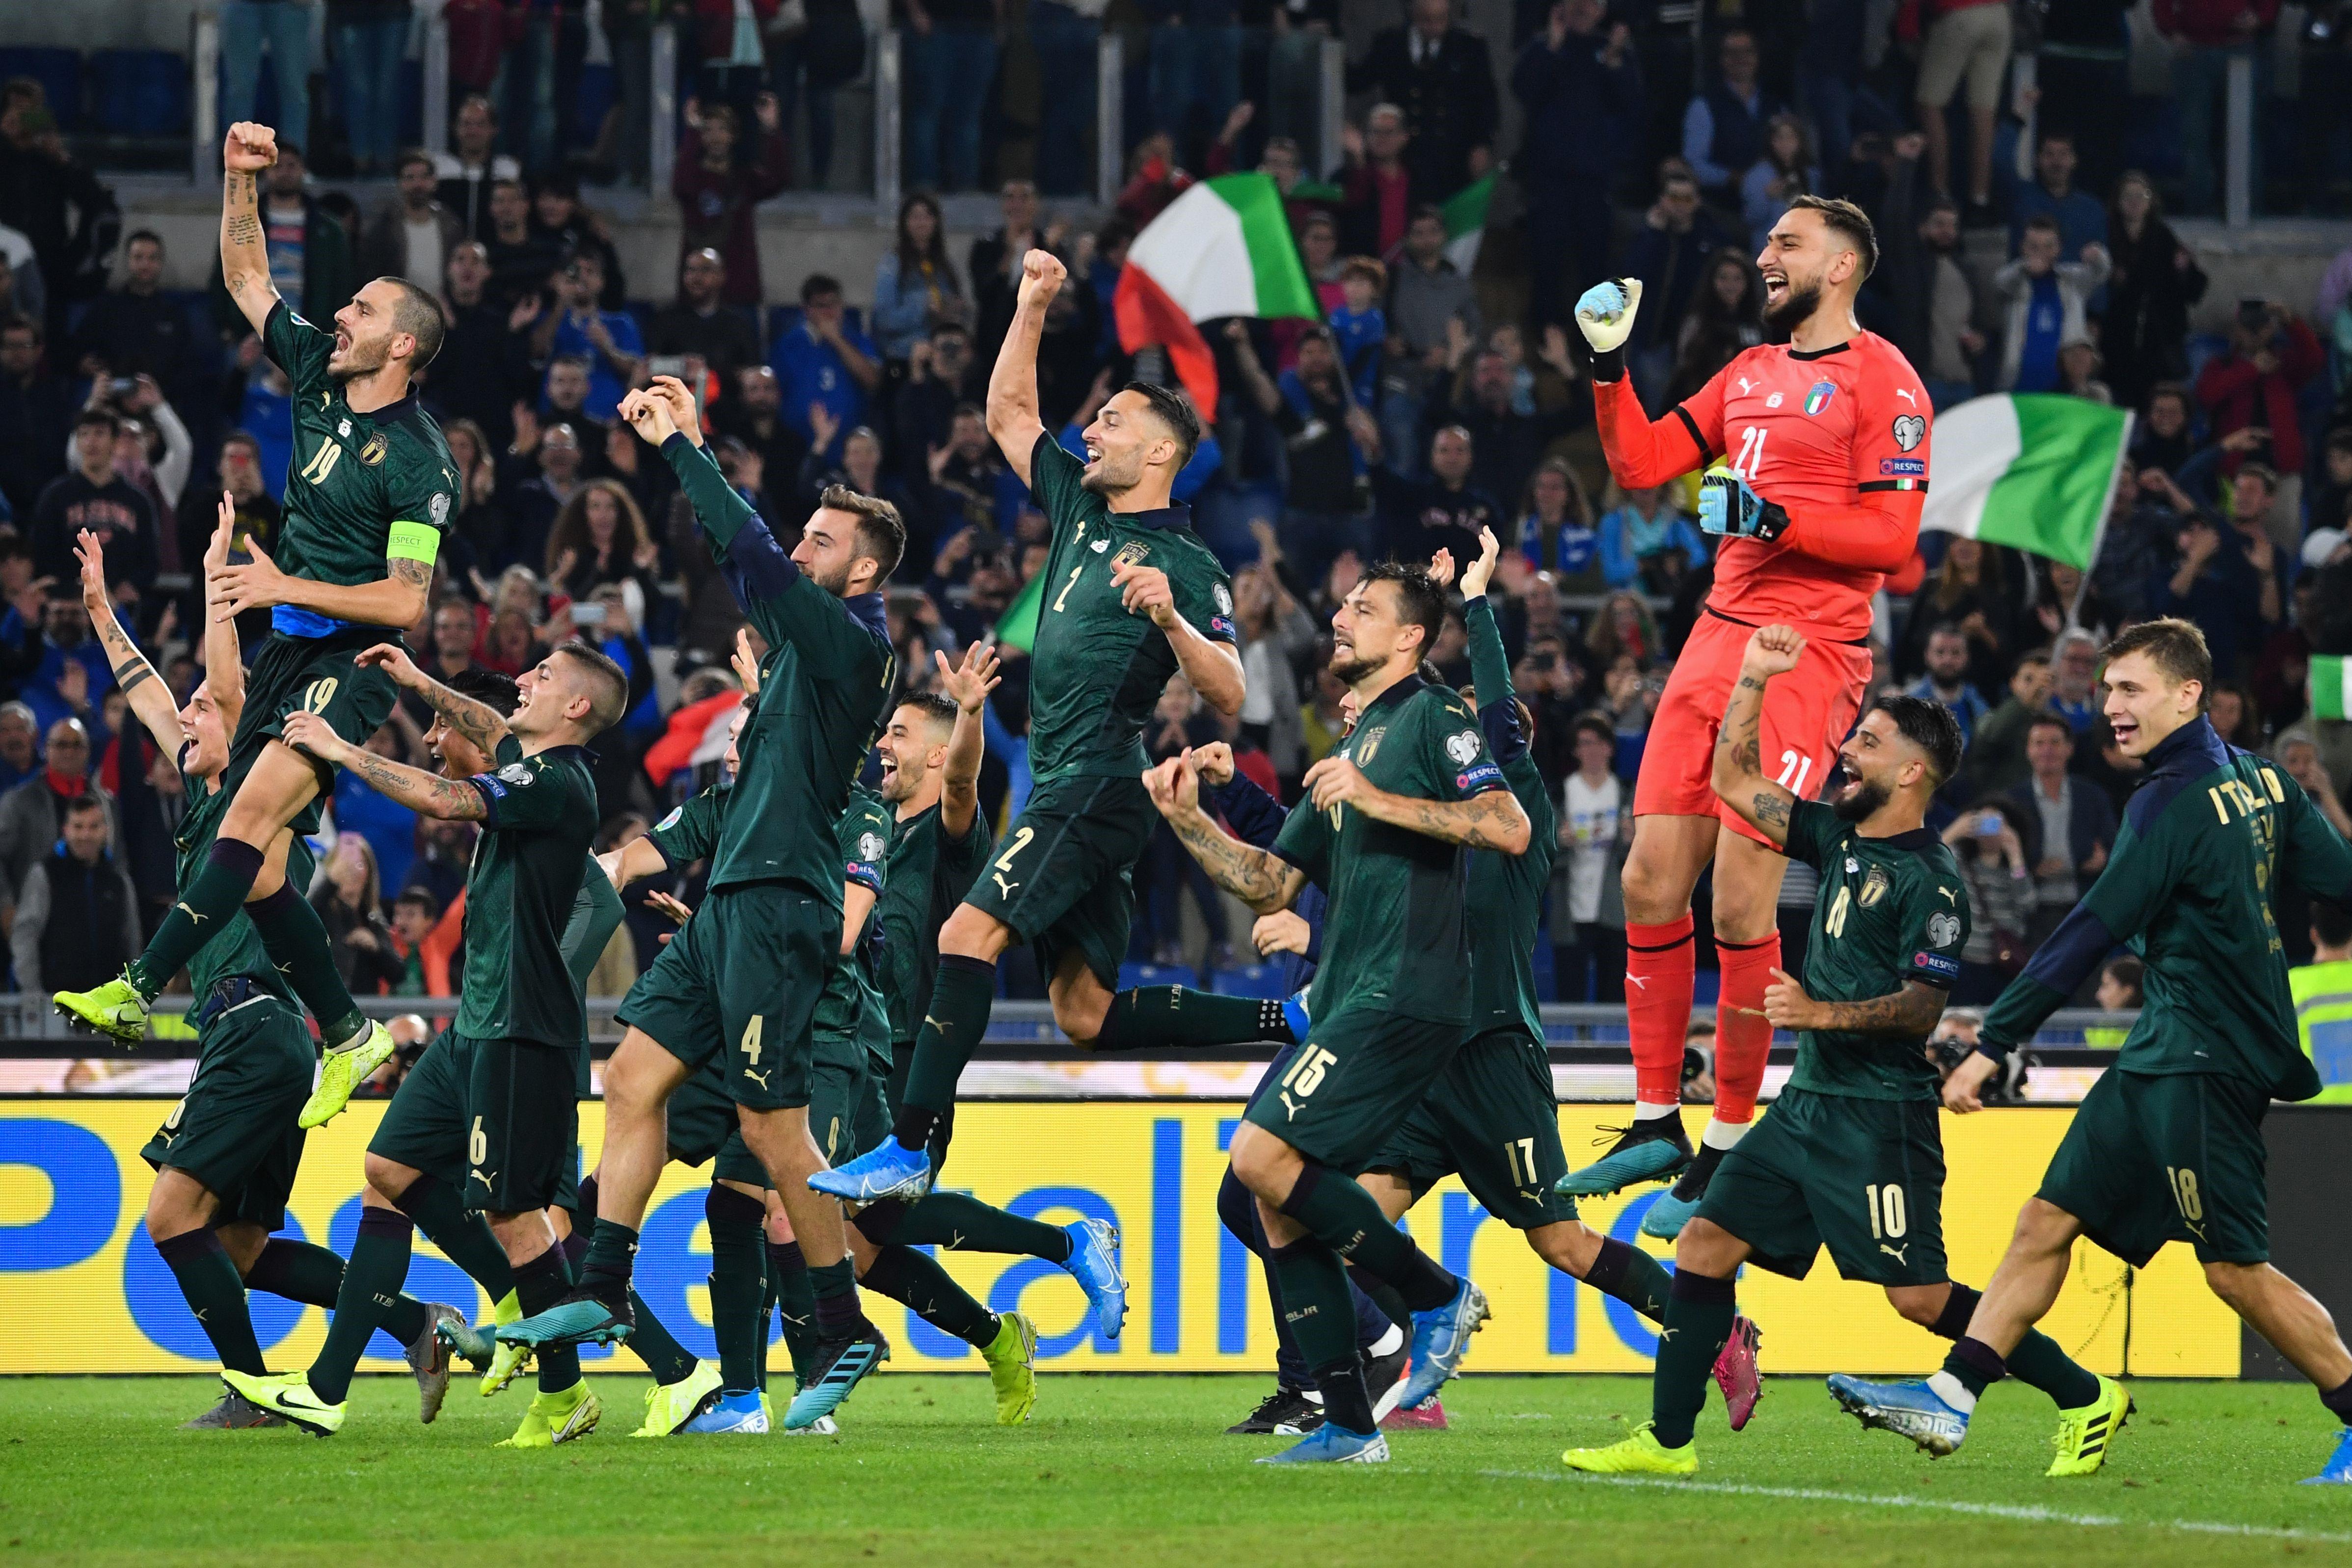 FOOTBALL MASCULIN CHAMPIONNAT D'EUROPE 2020 - Page 11 2695022